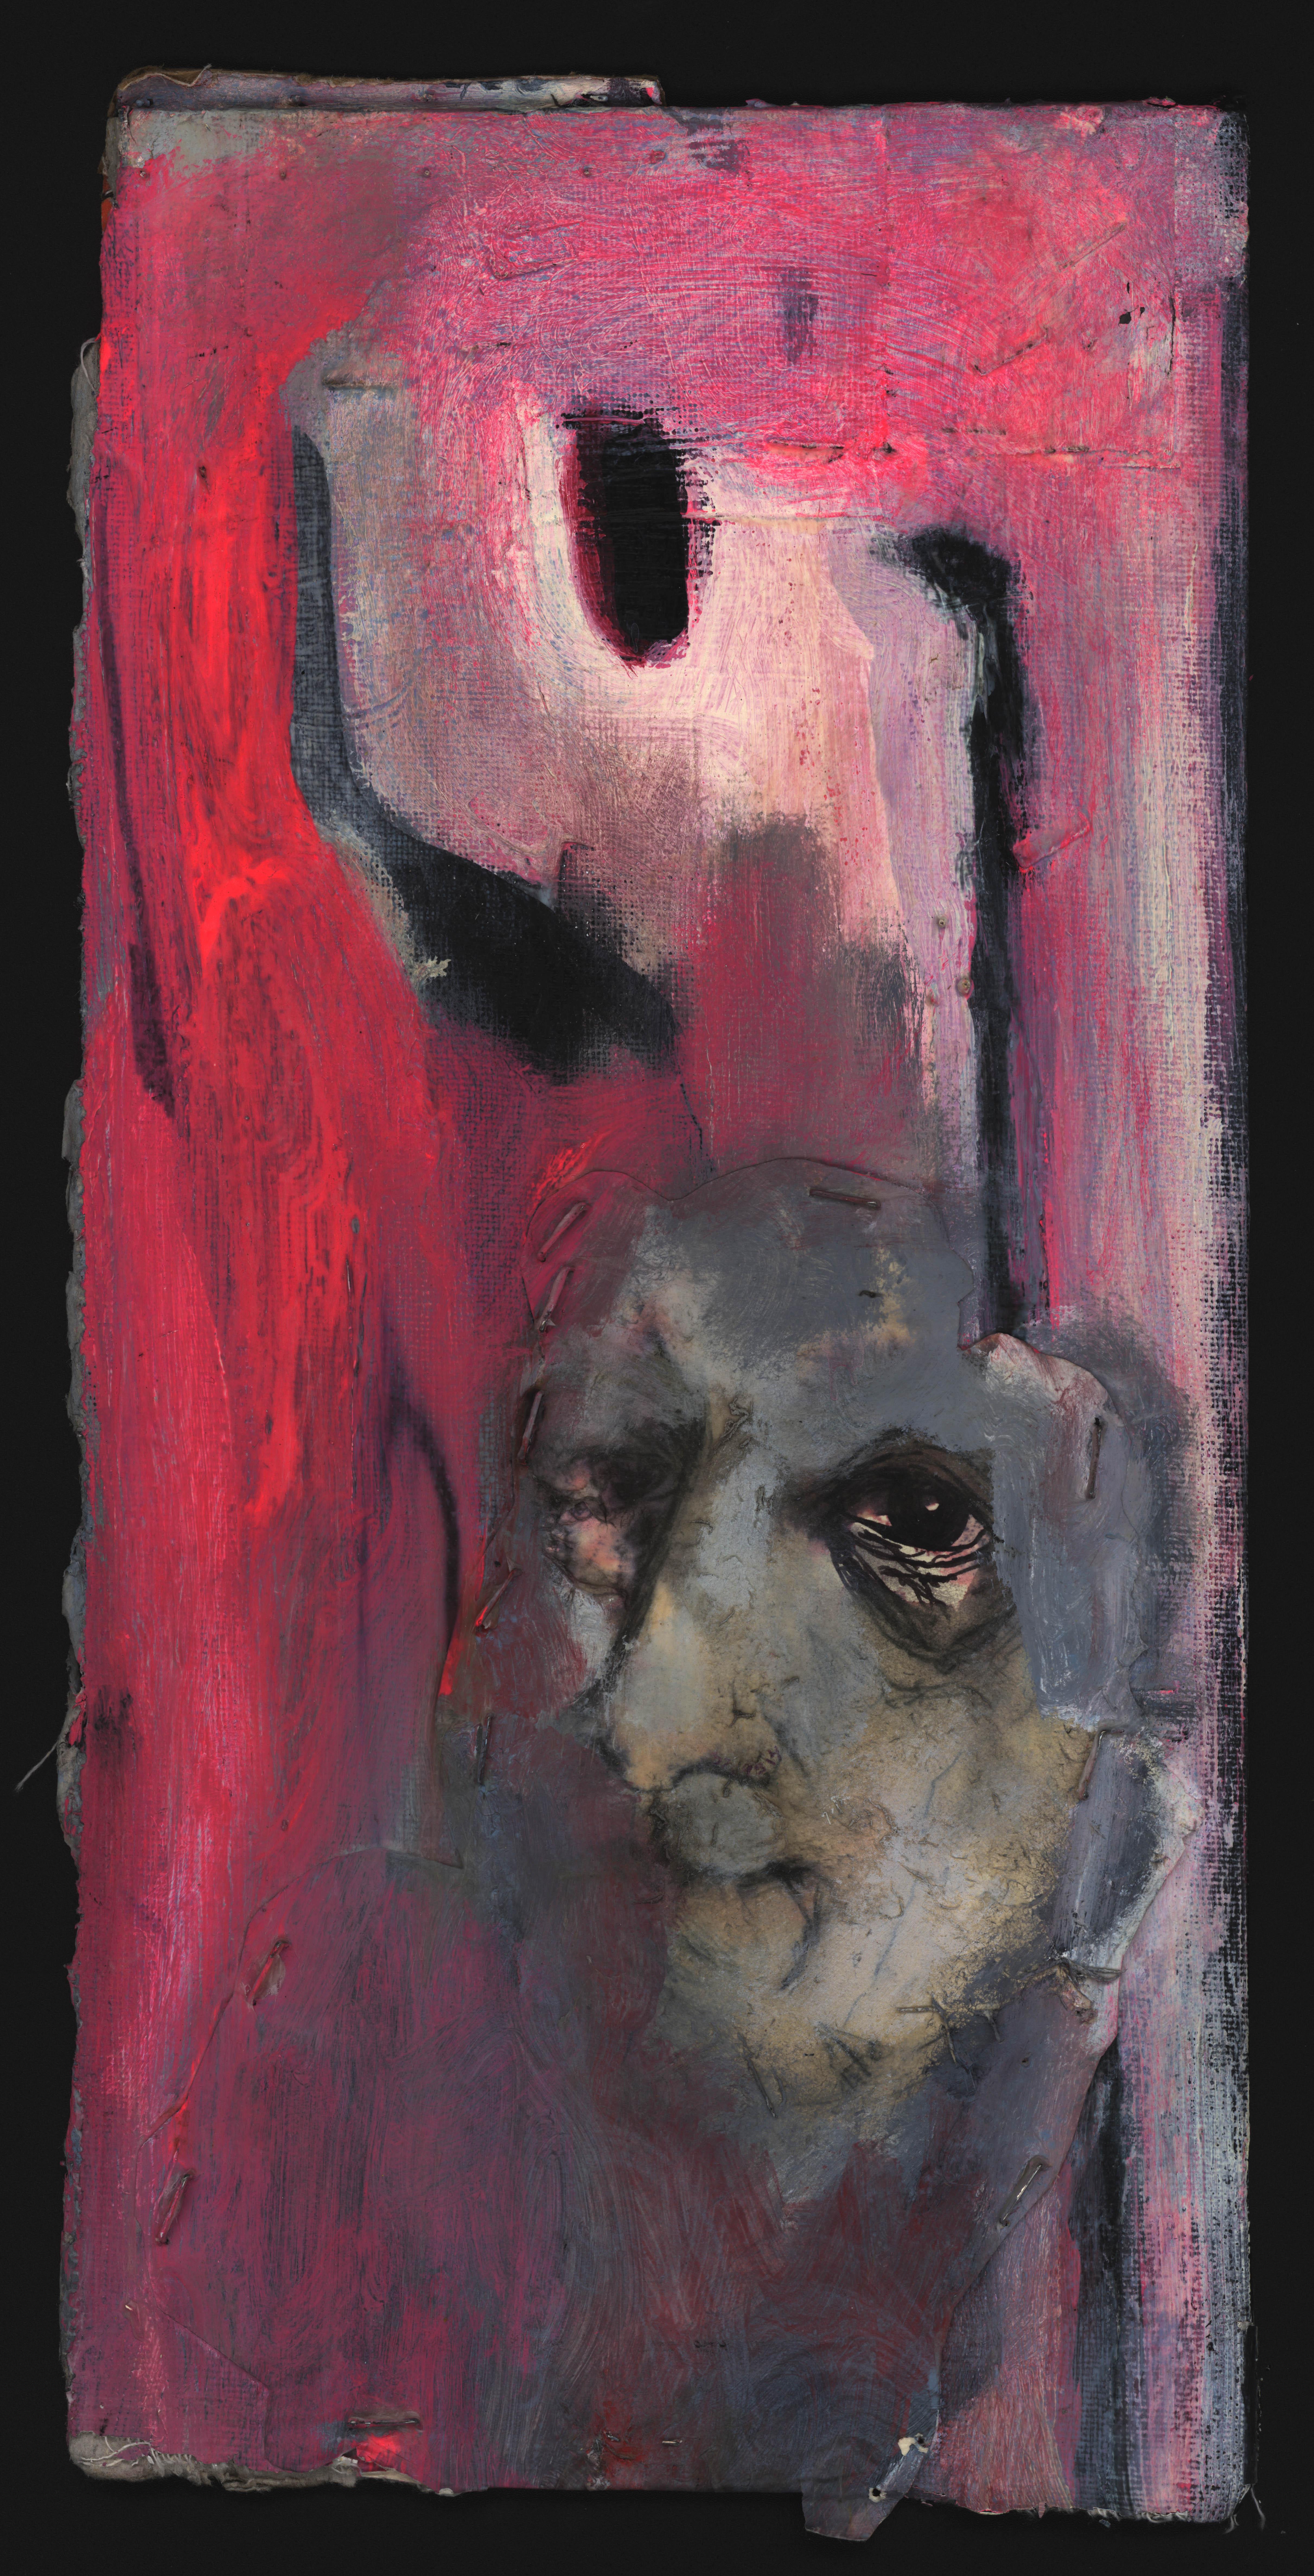 Untitled painting (2), undated